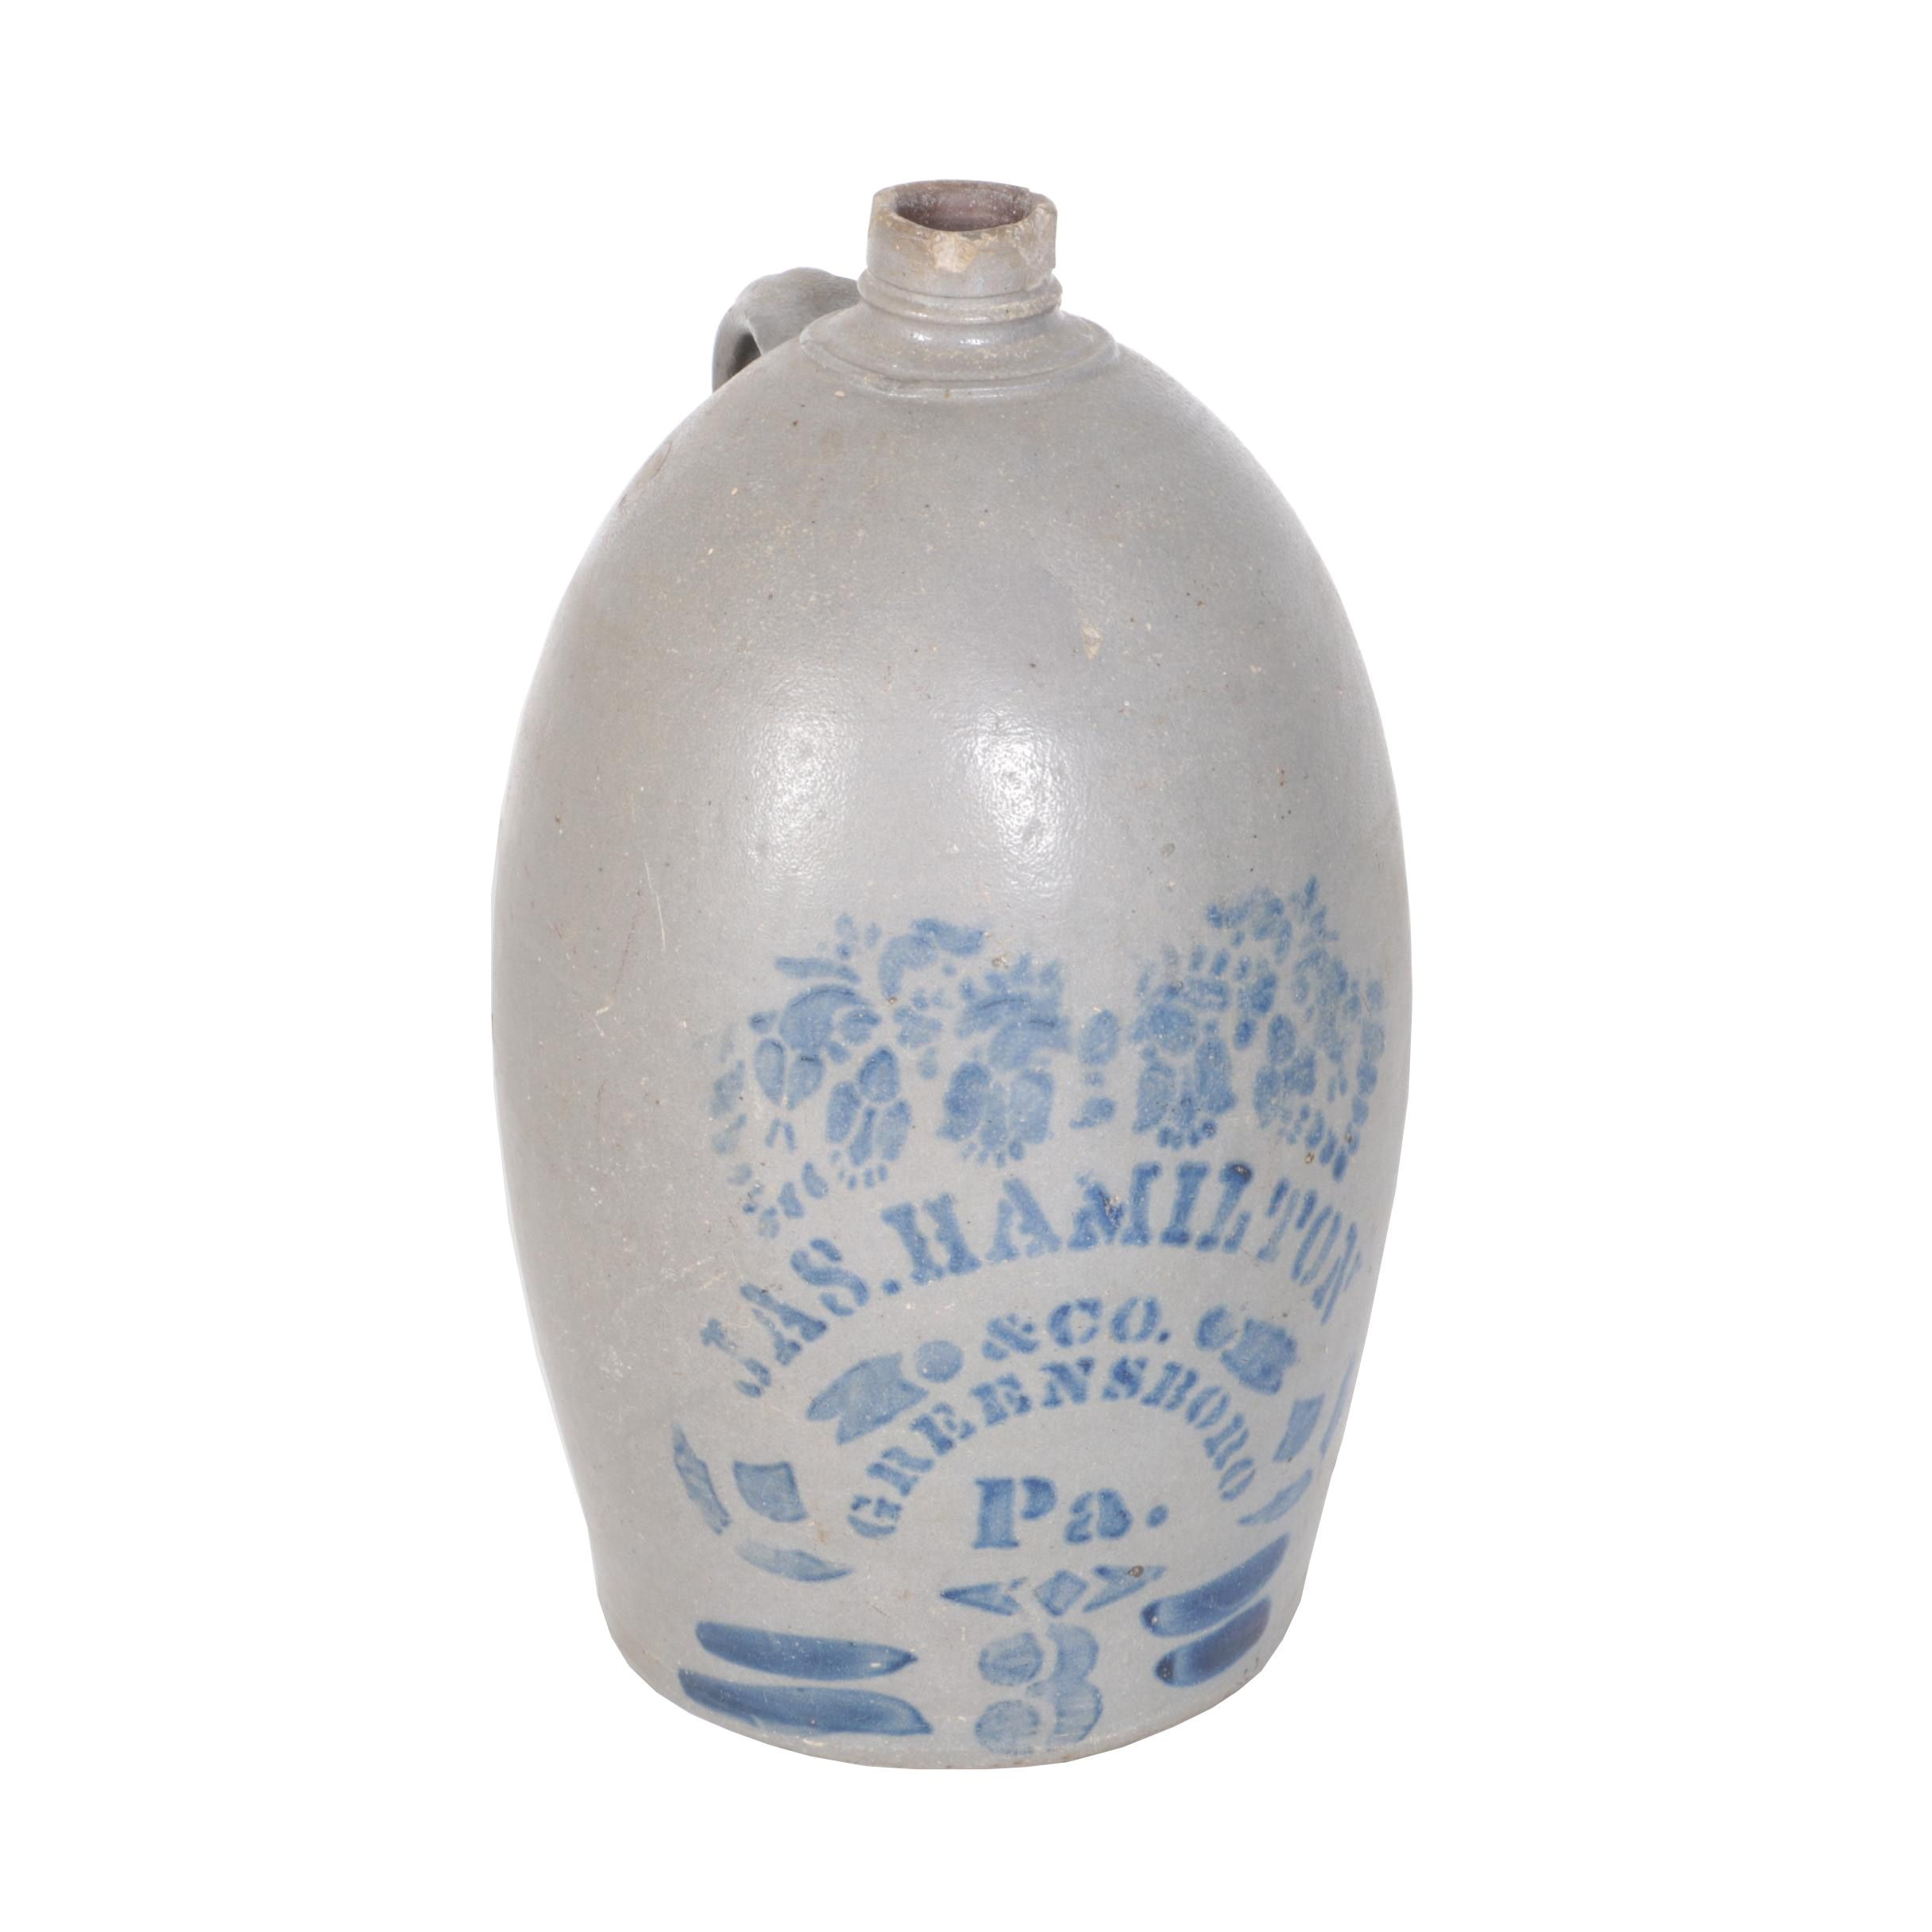 James Hamilton & Co. Stoneware Crock, Greensboro, Pennsylvania